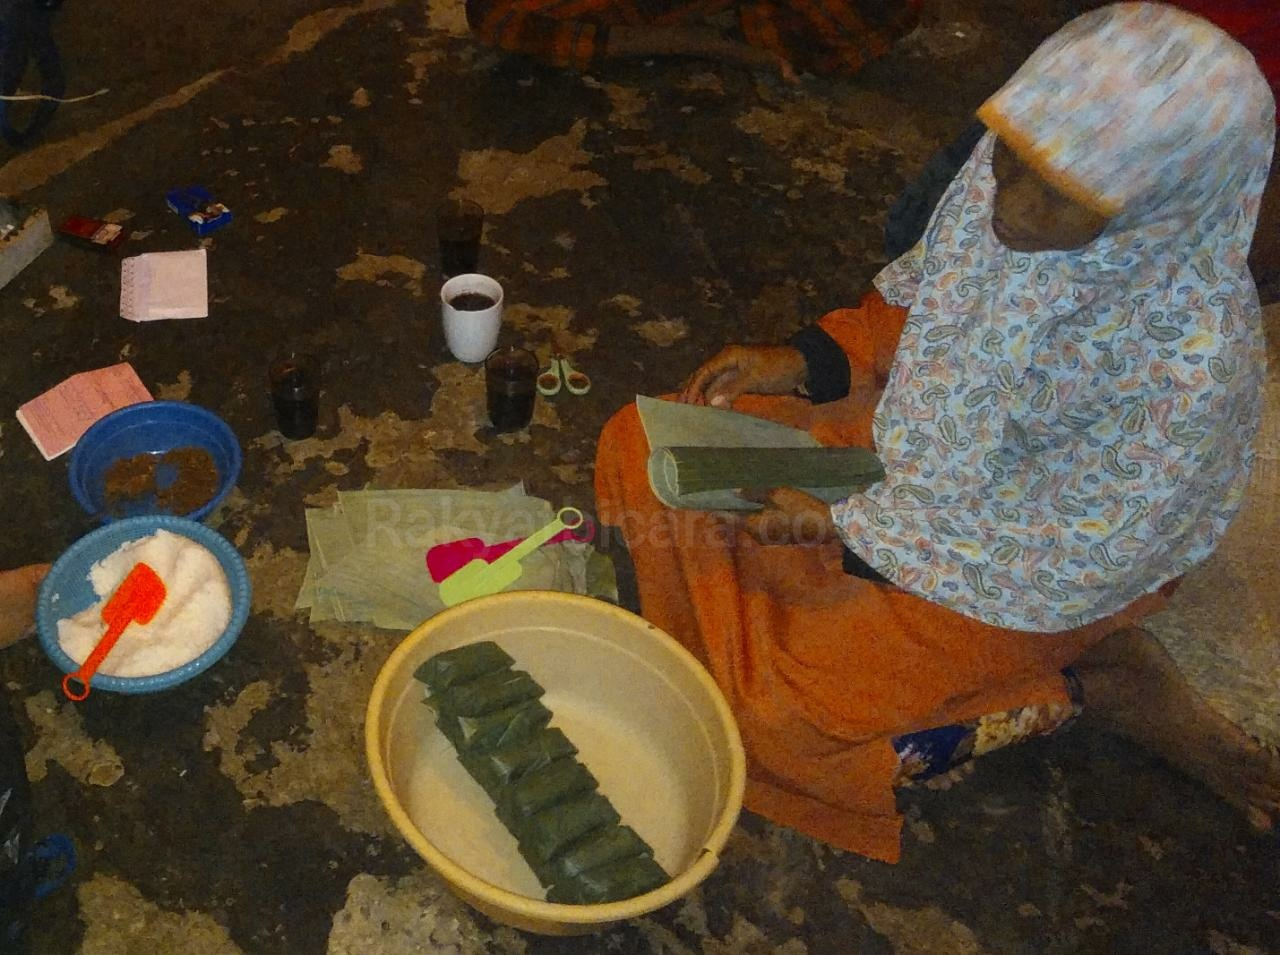 Nenek Berjuang Menghidupi 4 Orang Anak Yatim